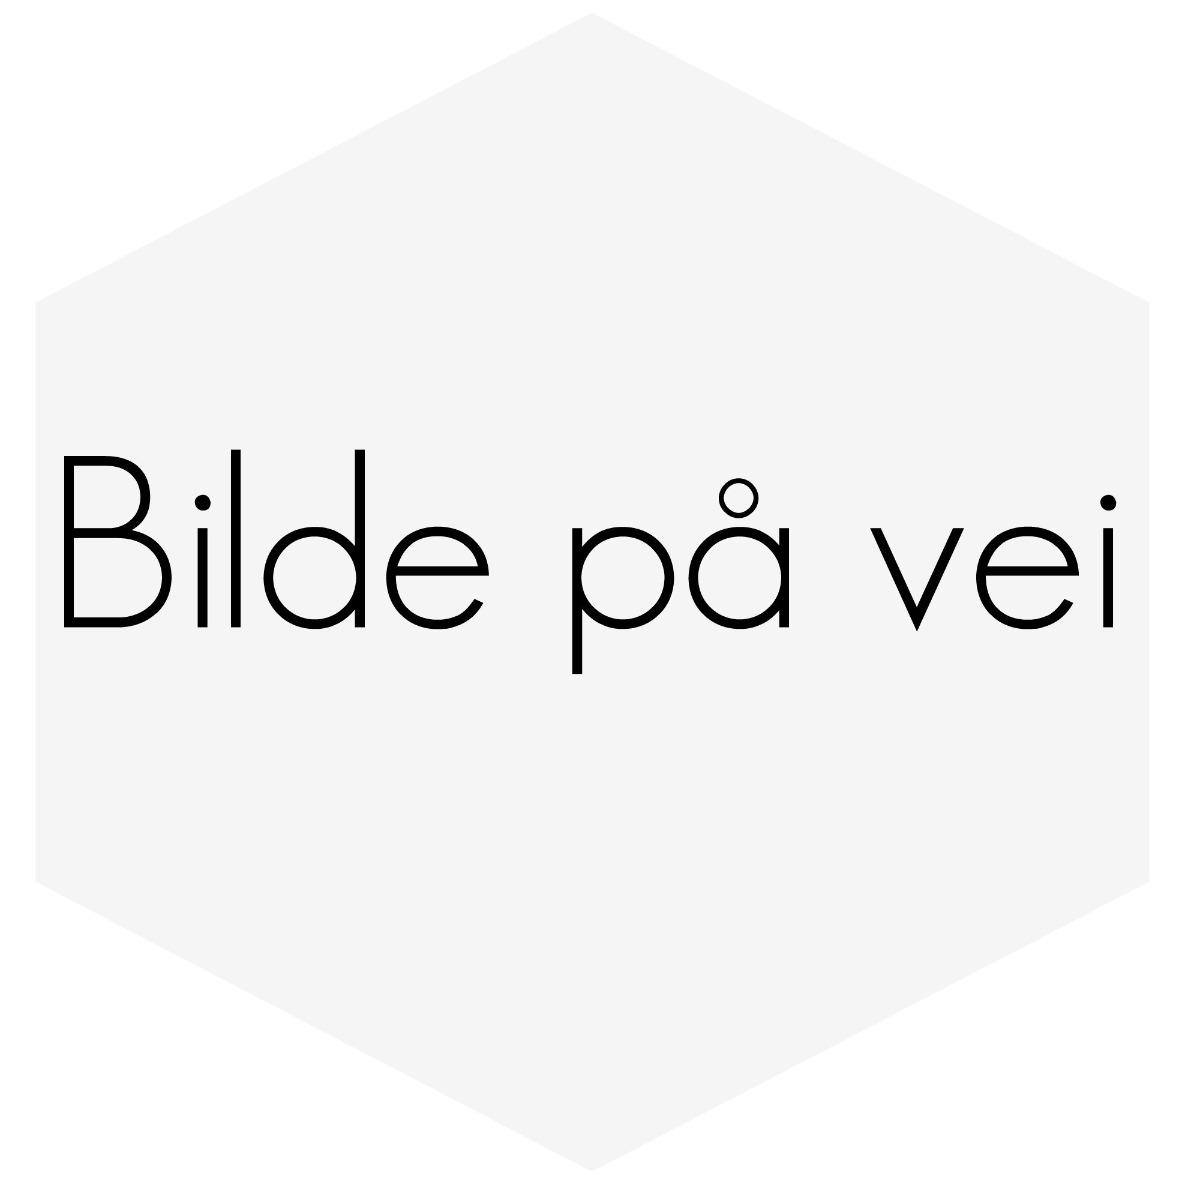 "SILIKONSLANGE DESIMETERVARE BLÅ 5"" (127MM)"